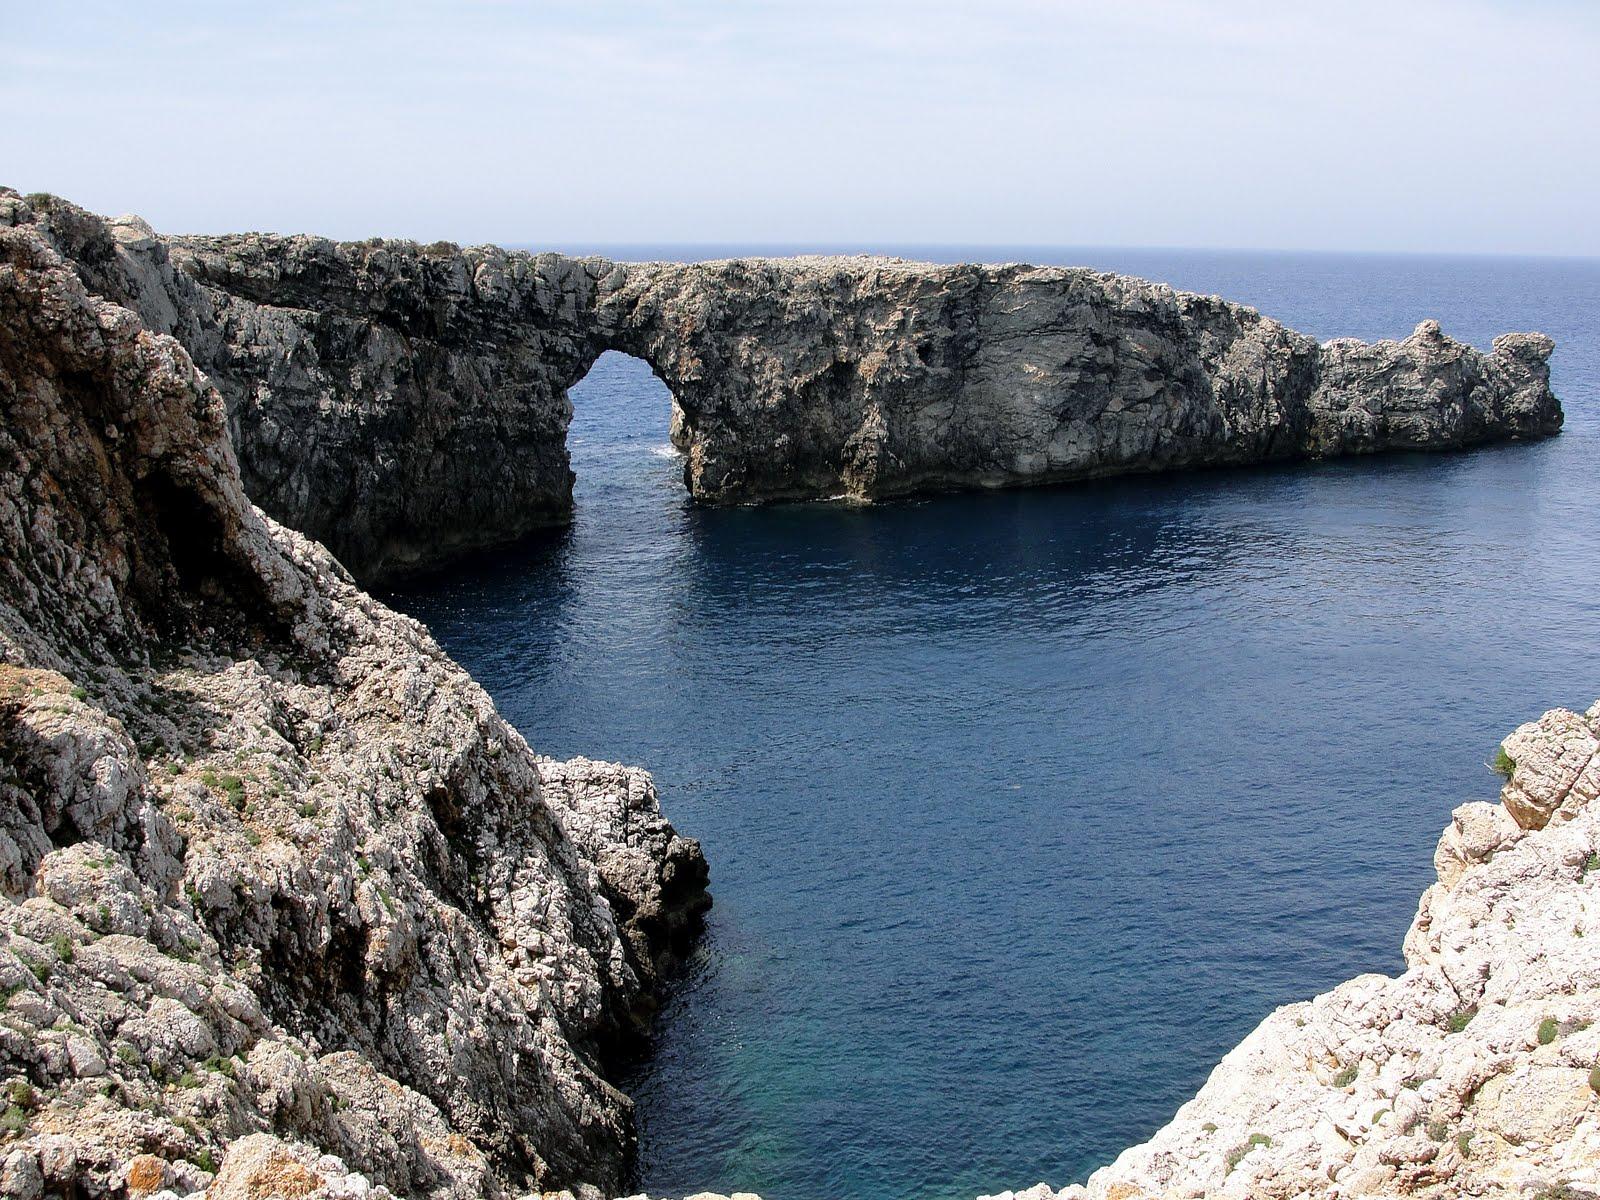 Racons del món: Costa Brava bwin 5 euro bwin Newsletter / Posta de sol a Menorca